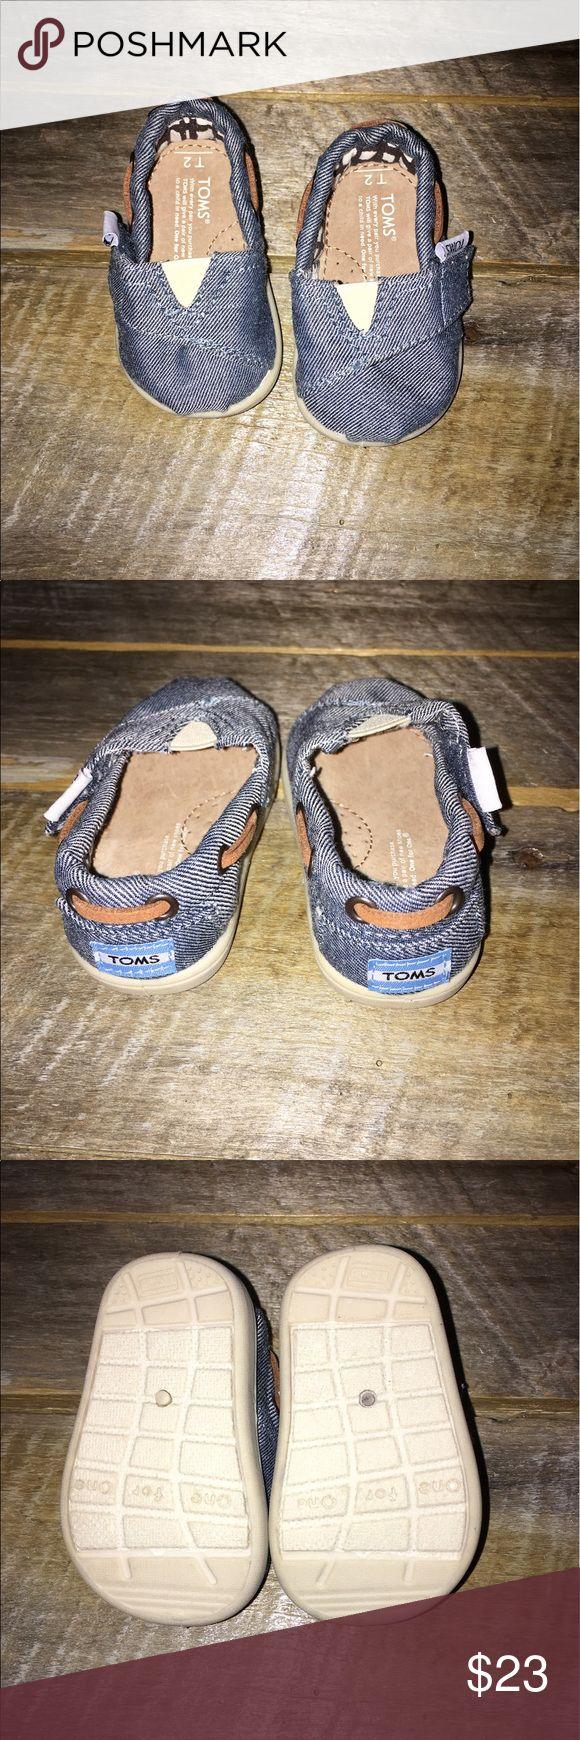 Tiny TOMS T2 Bimini Shoes Size T2. Baby/Infant. unisex TOMS Shoes Baby & Walker